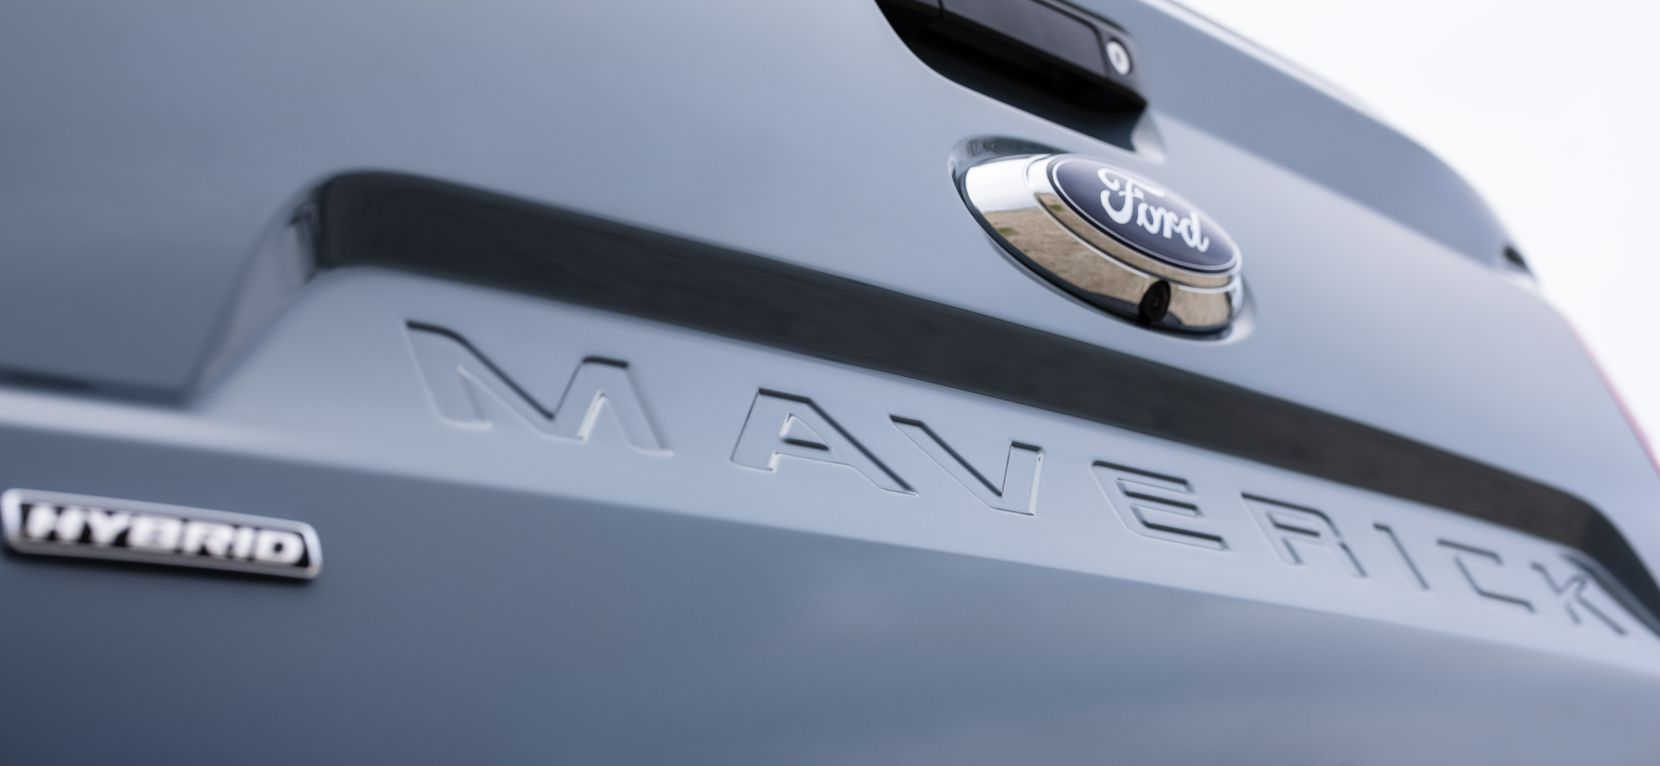 The 2022 Ford Maverick Hybrid XLT.